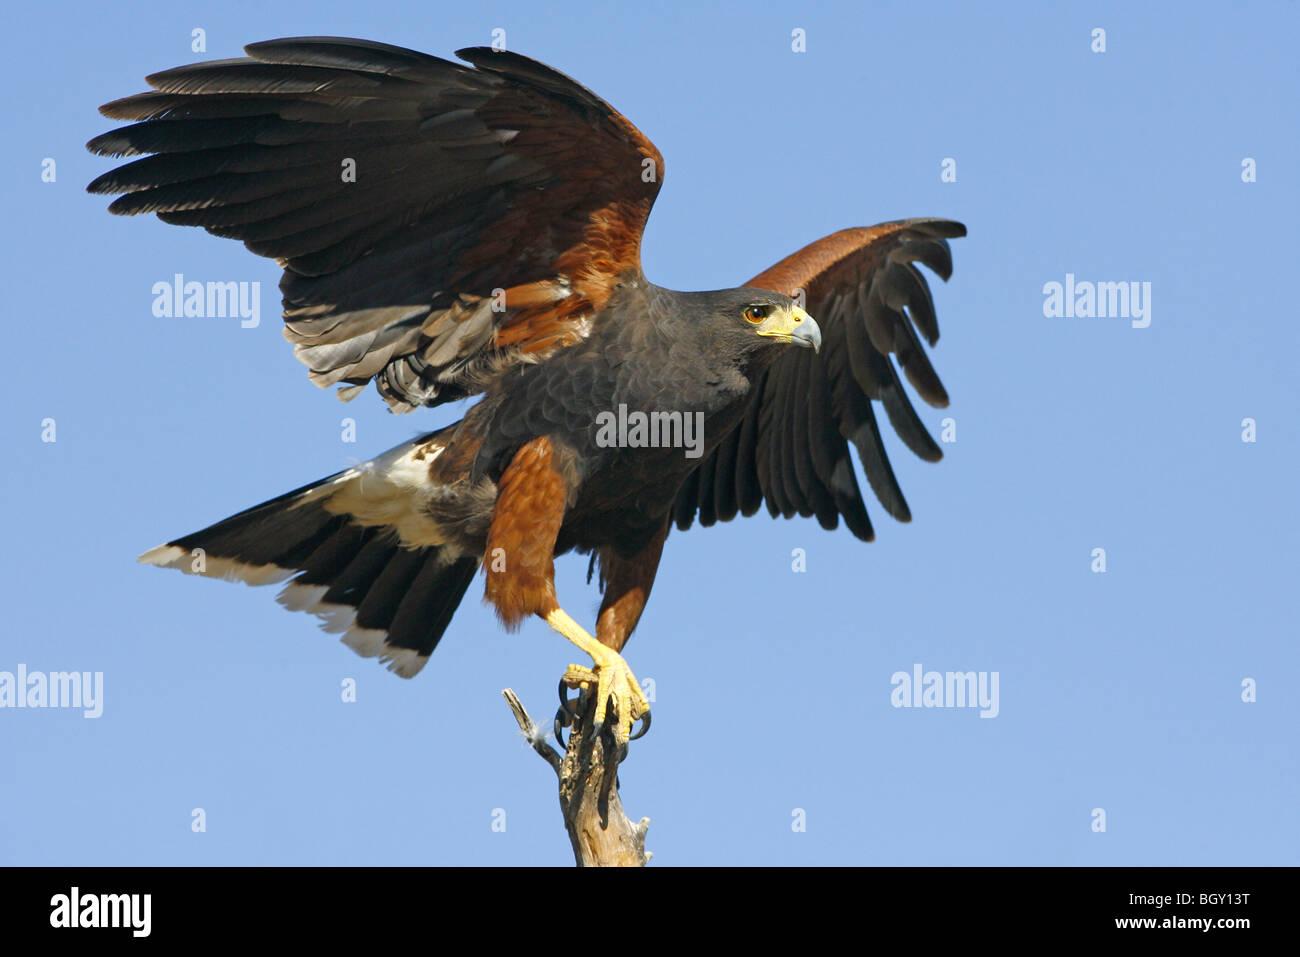 Harris' Hawk - Stock Image